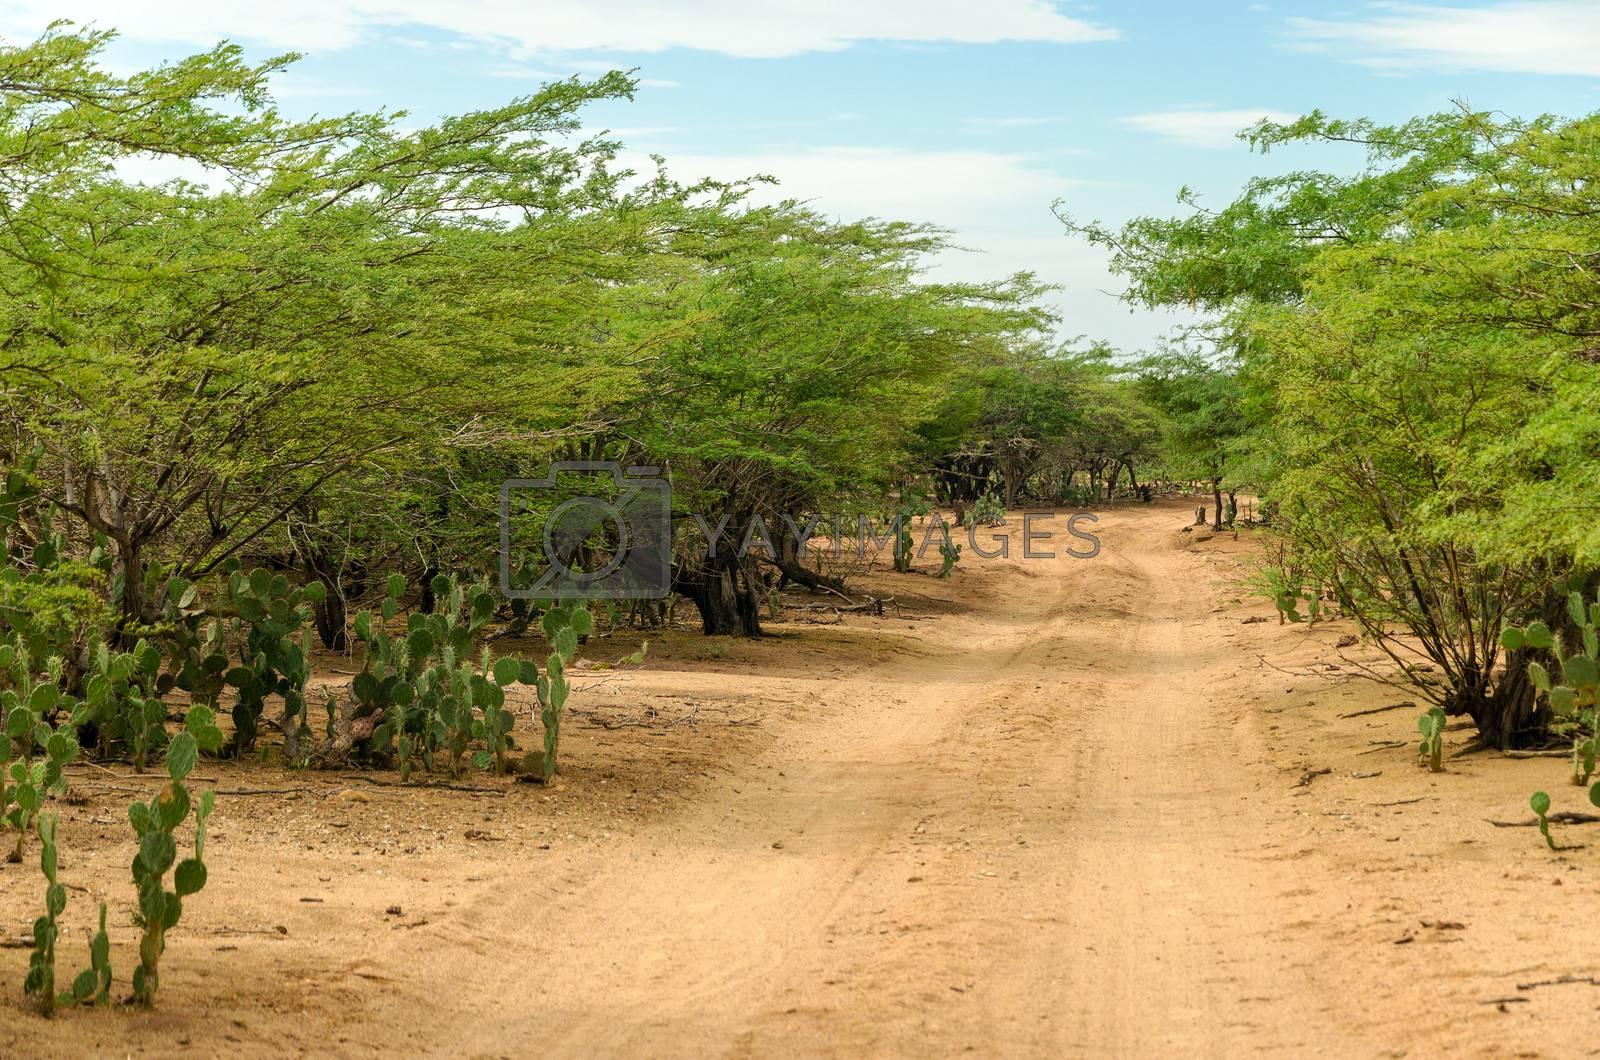 Dirt road passing through and arid region in La Guajira, Colombia